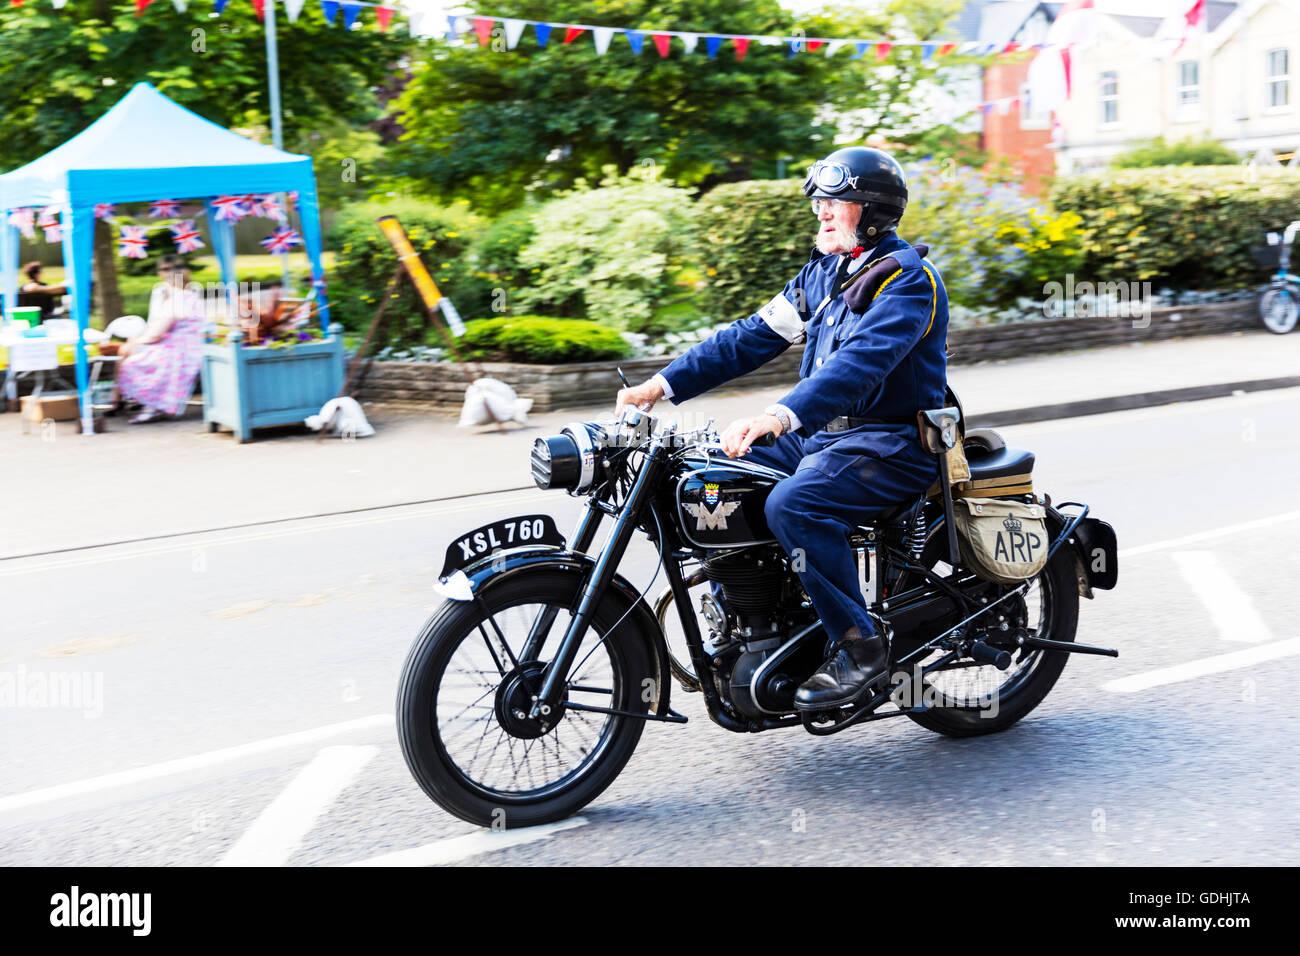 Old man riding motorbike on road down street vintage bike unsafe danger dangerous scary - Stock Image